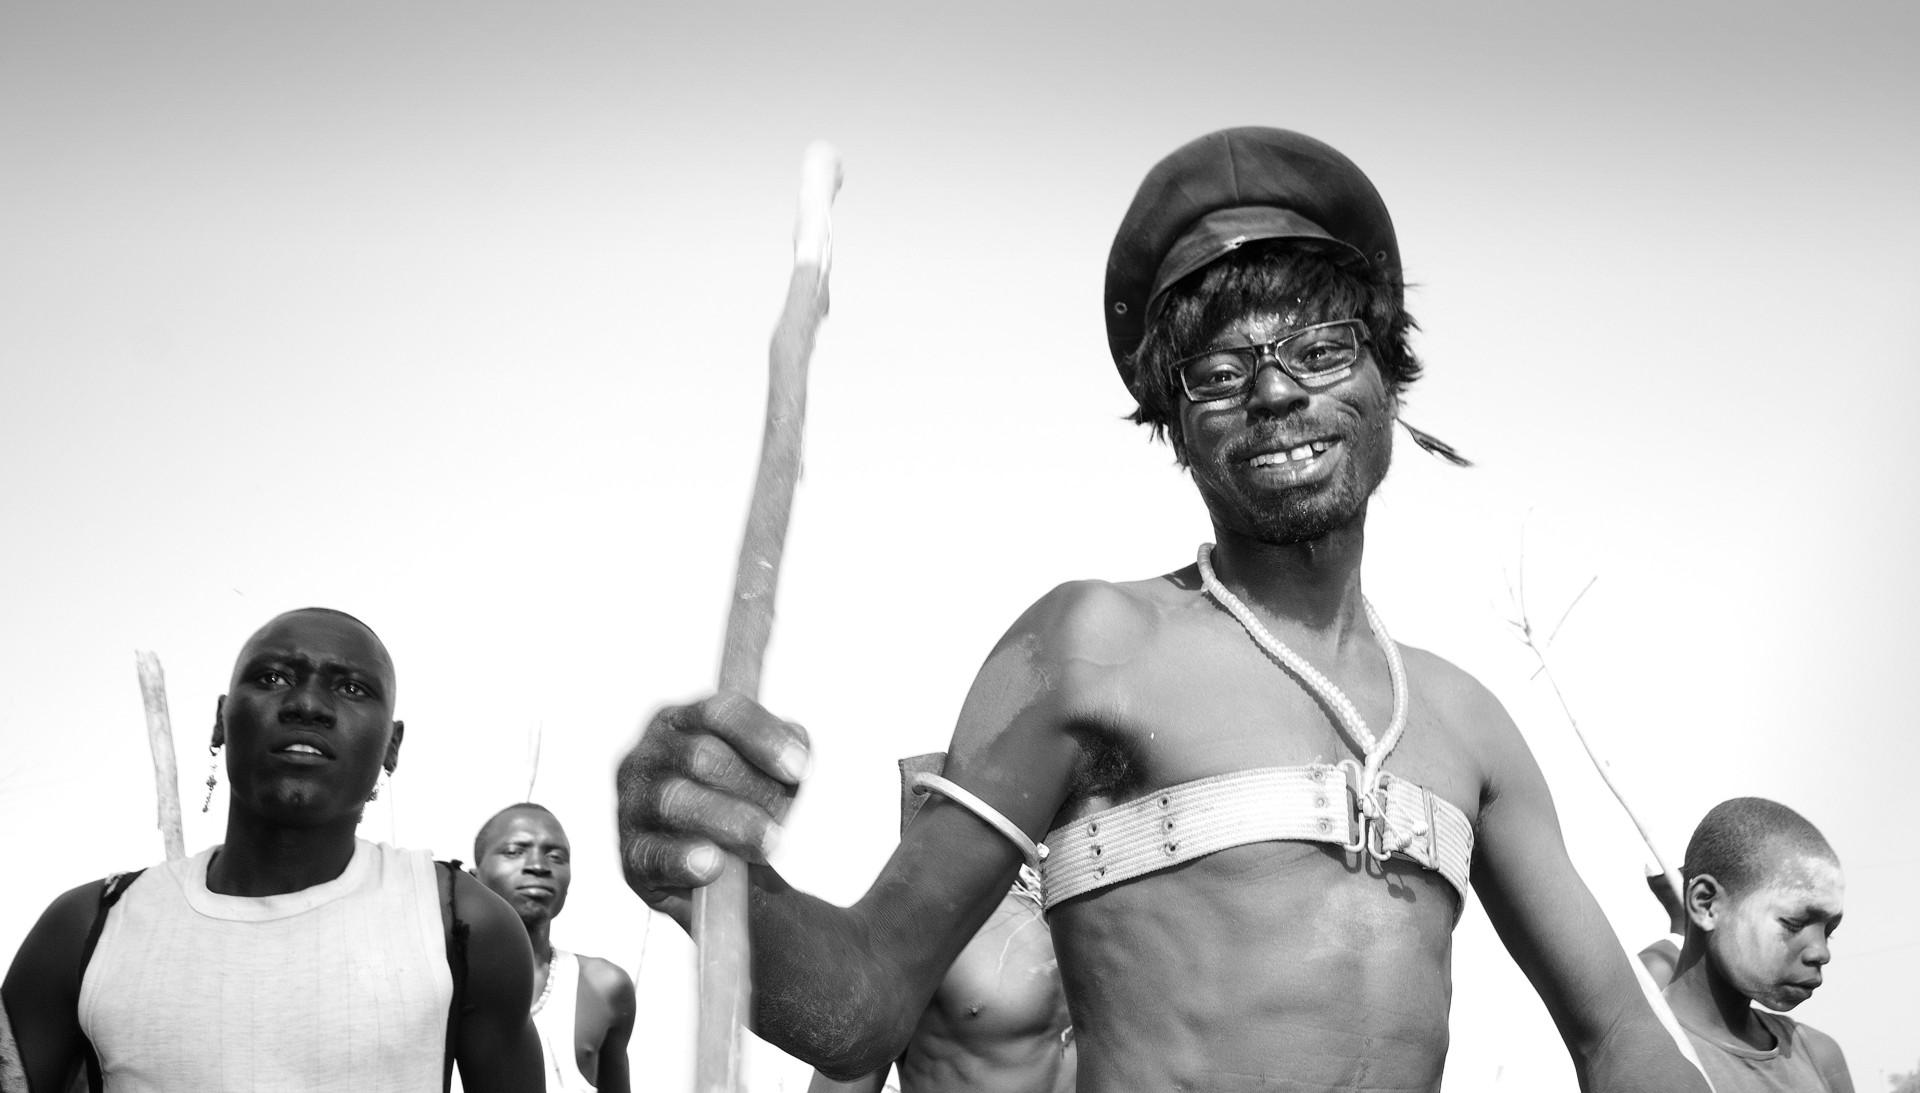 Blaise Djilo, Feou Kake series (2012-16). Image courtoisie YaPhoto